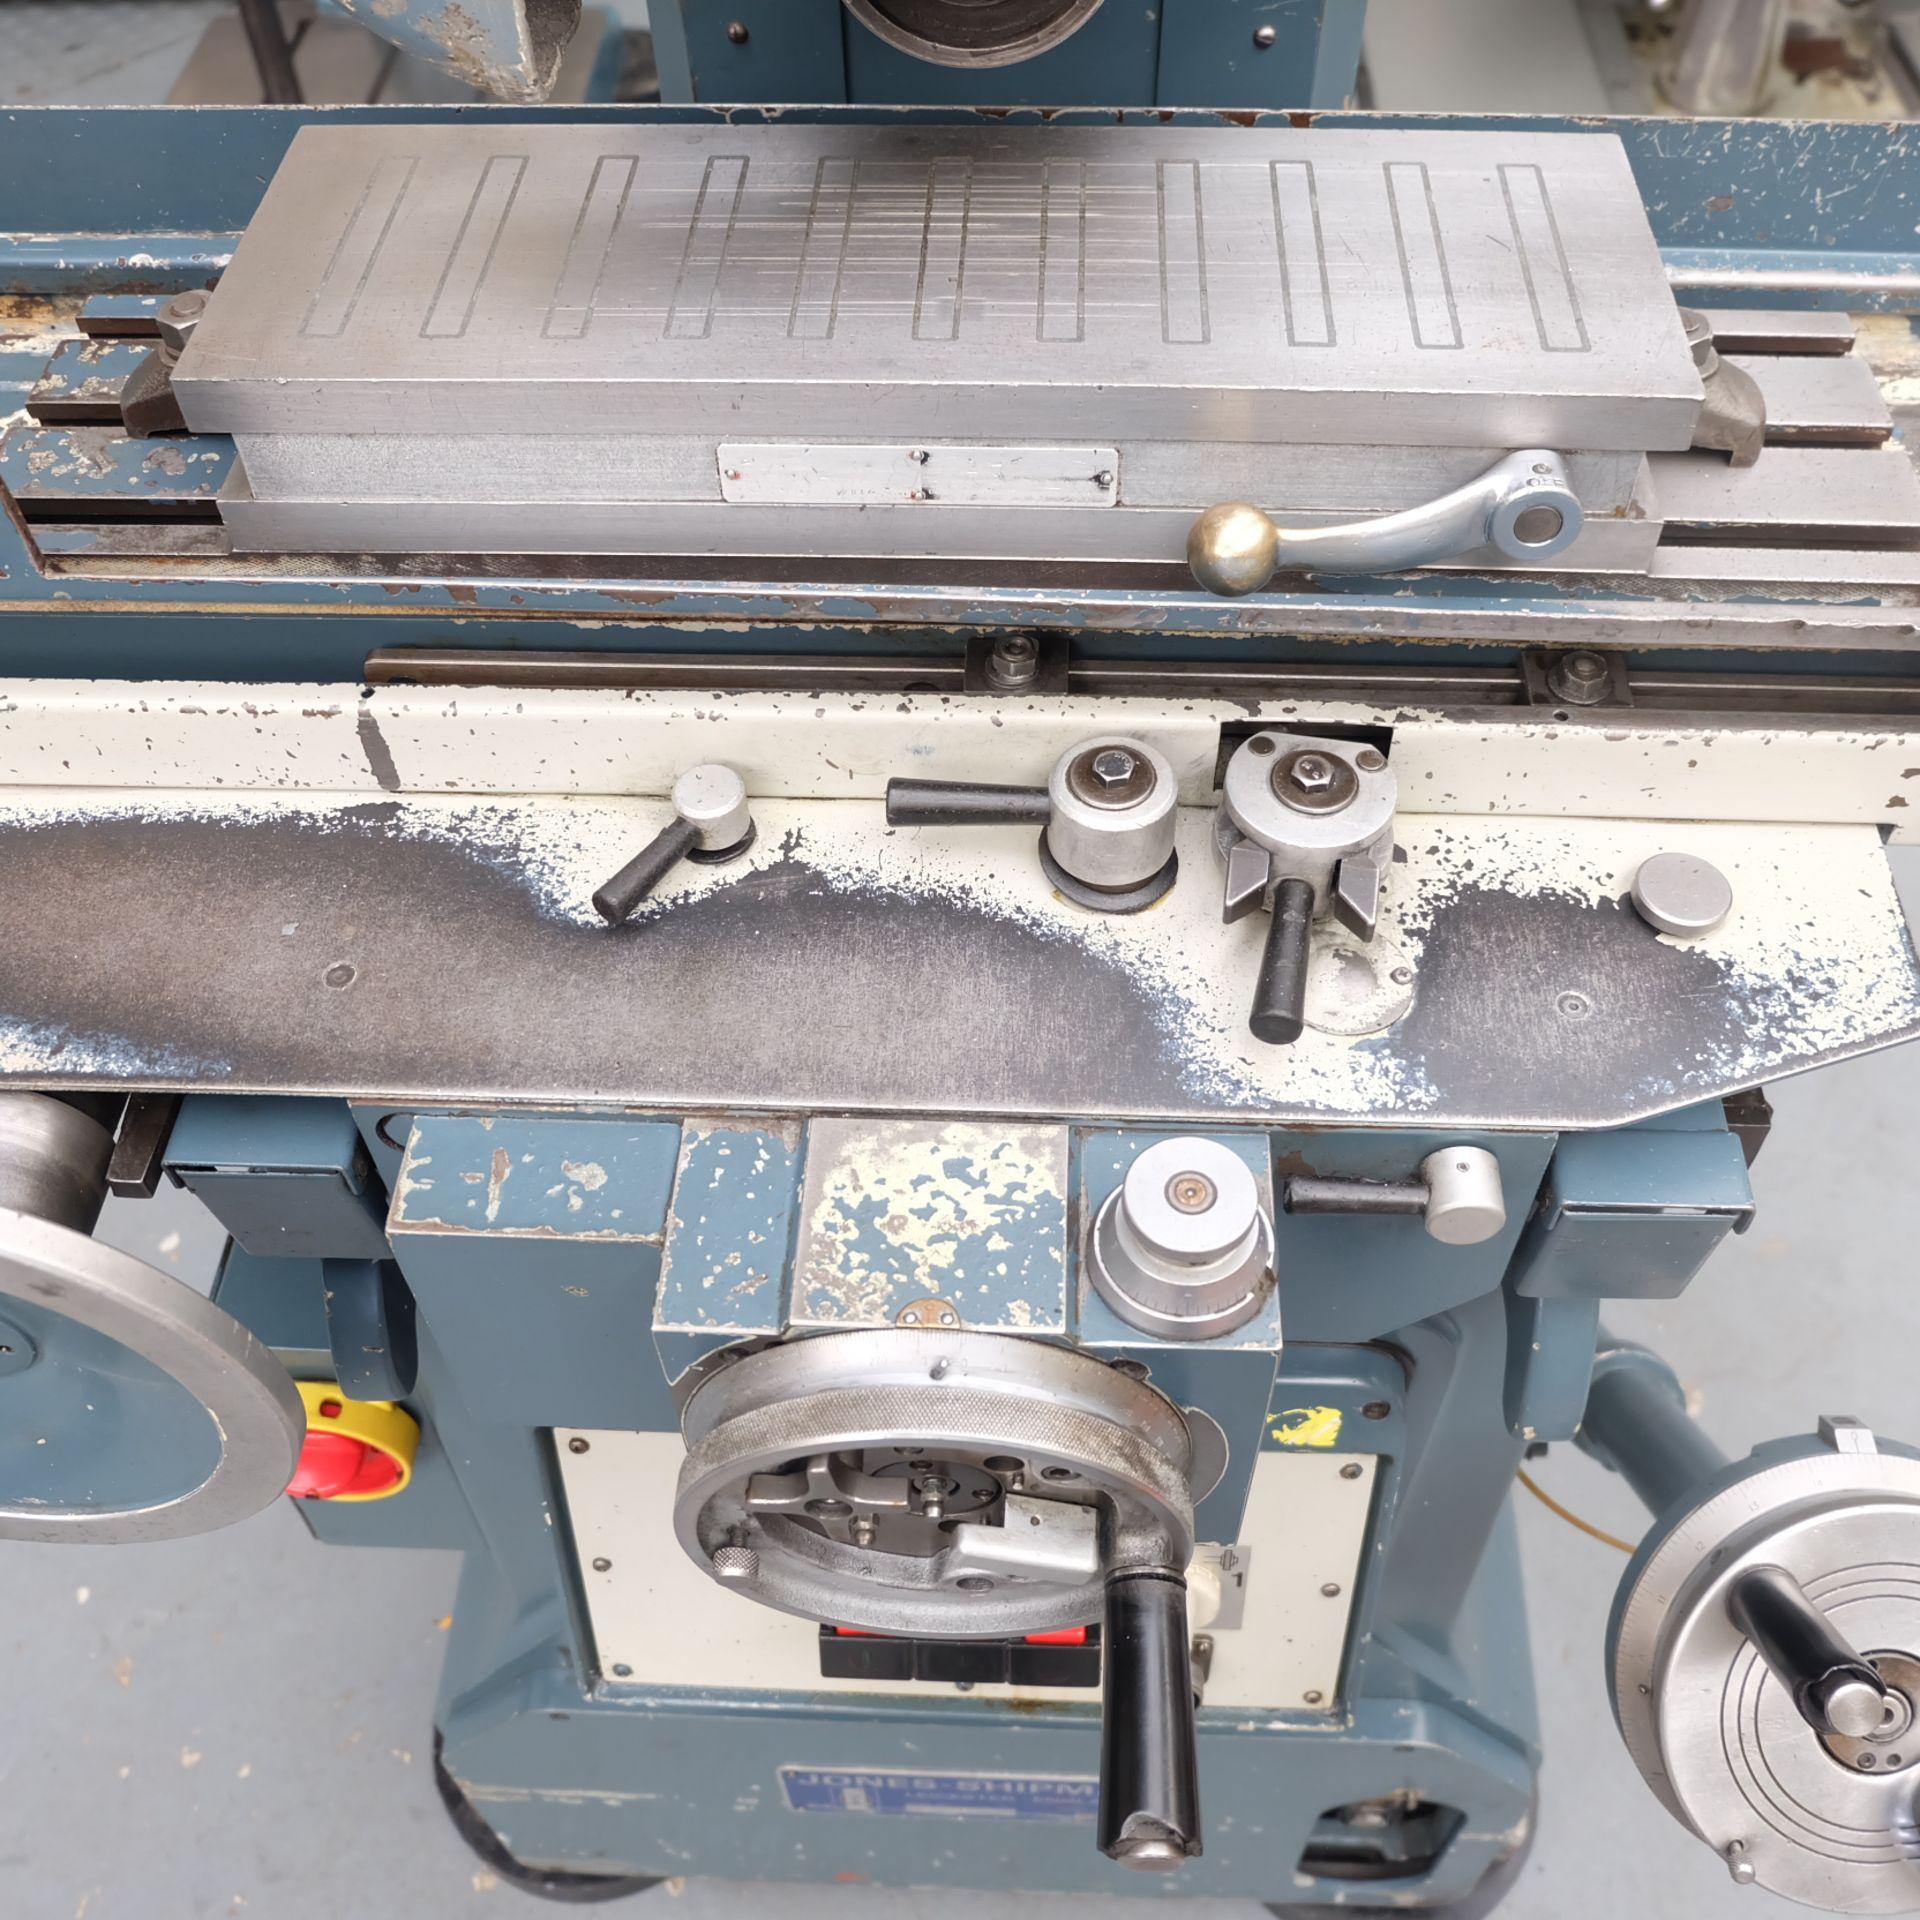 "Jones & Shipman 540 Surface Grinder. Capacity 18"" x 6"". Imperial Dials. - Image 5 of 8"